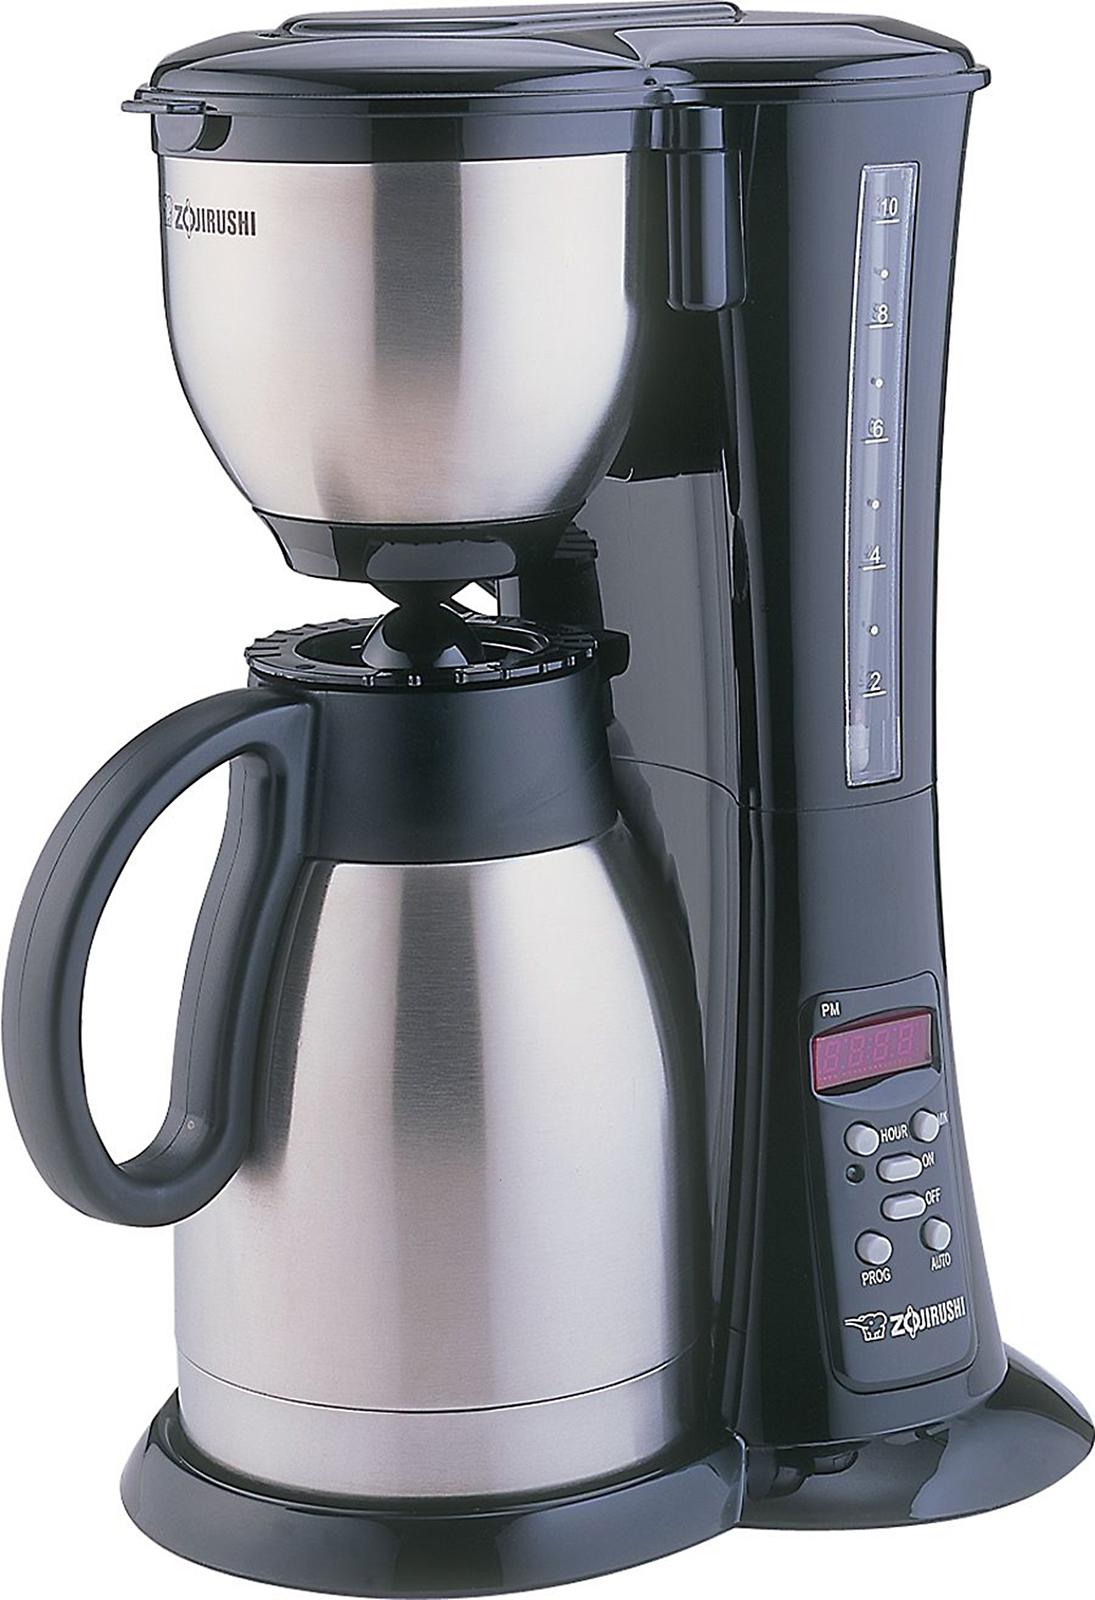 Sears Coffee Makers Sale